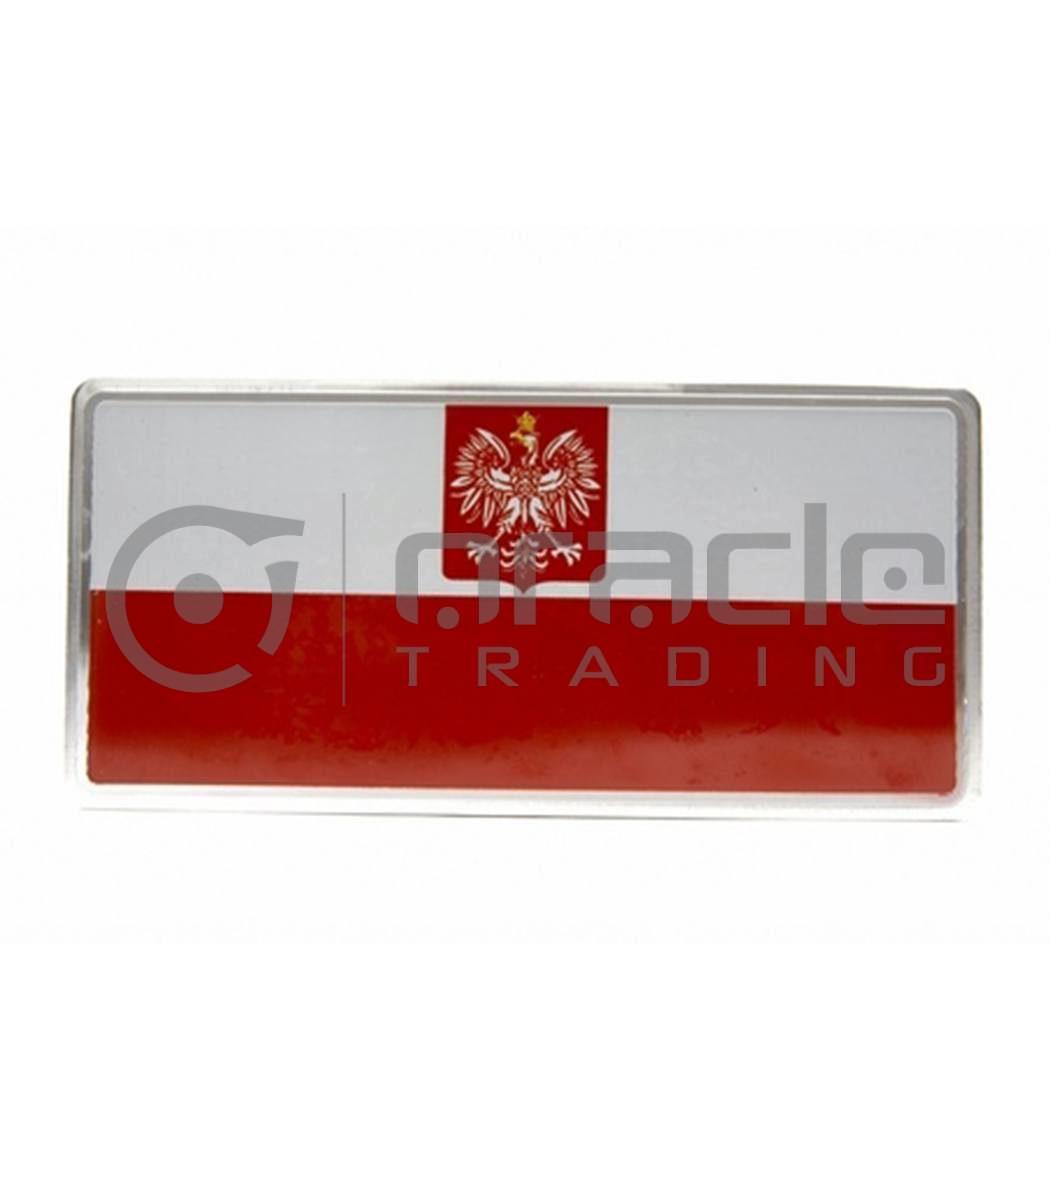 Poland Plate Sticker